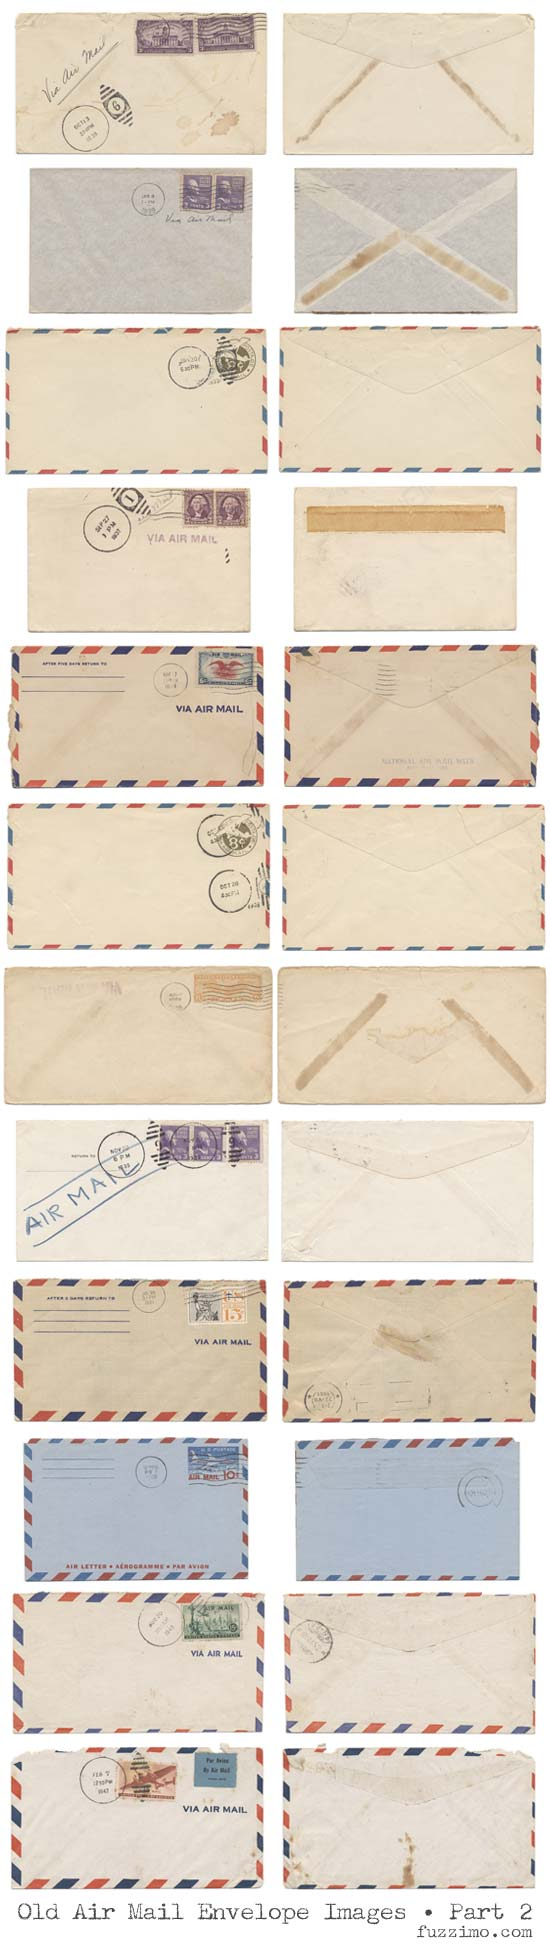 Free Hi-Res Old Air Mail Envelope Images 2 ...